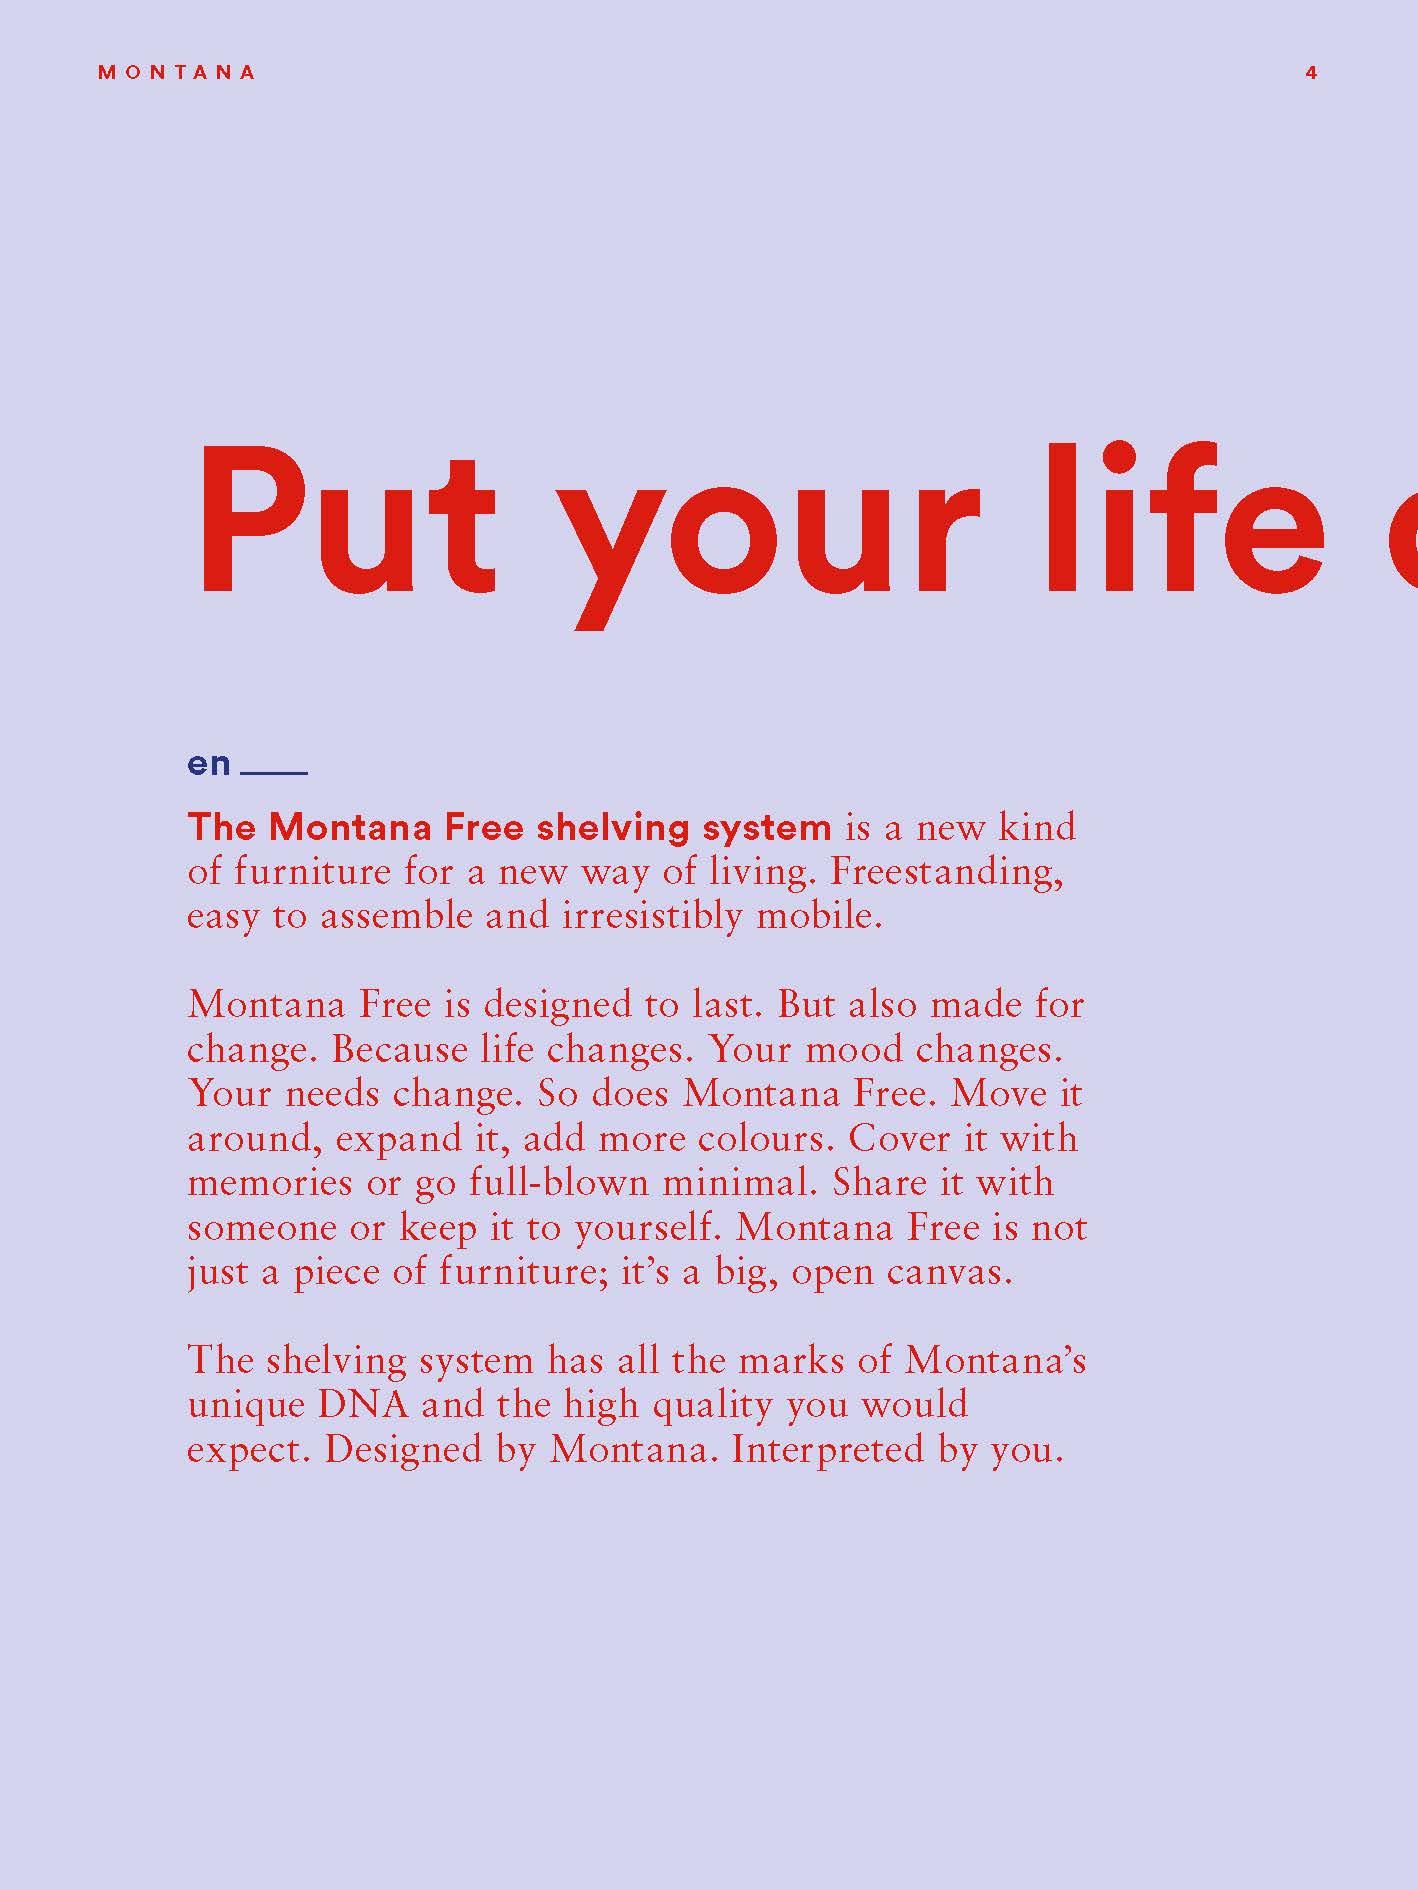 2018_Brochure_MontanaFree_Side_04.jpg